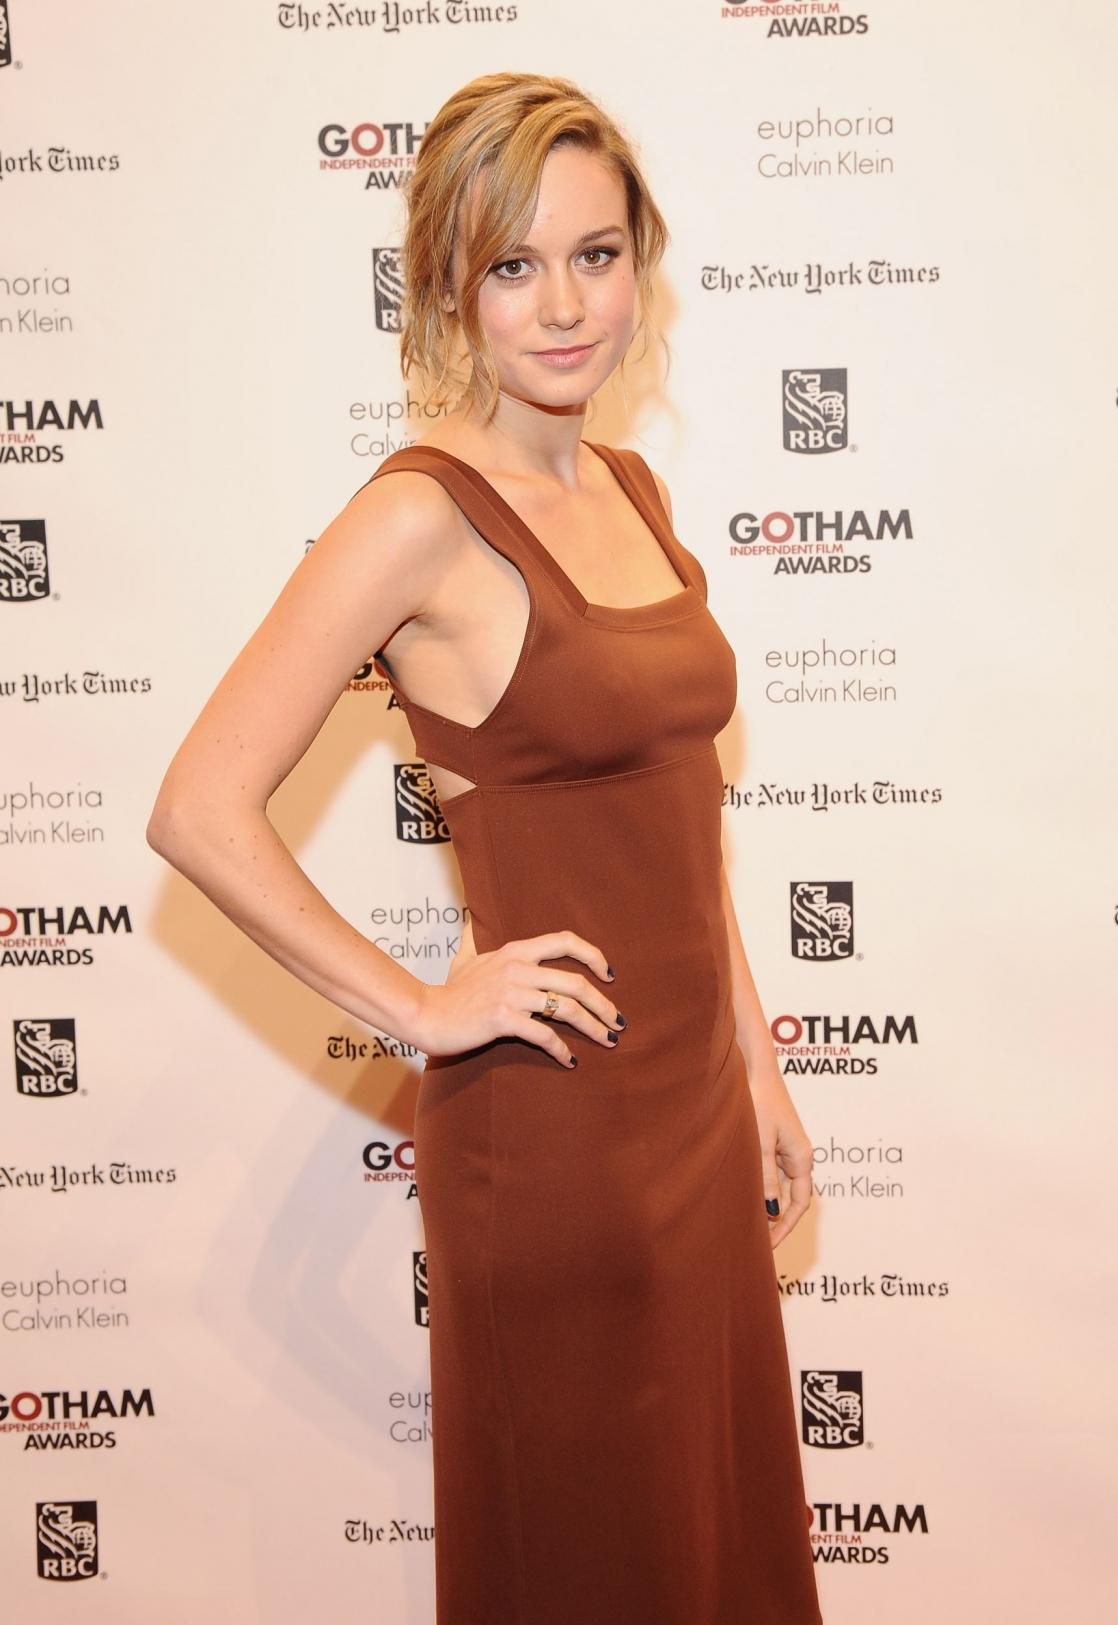 Brie Larson hot images